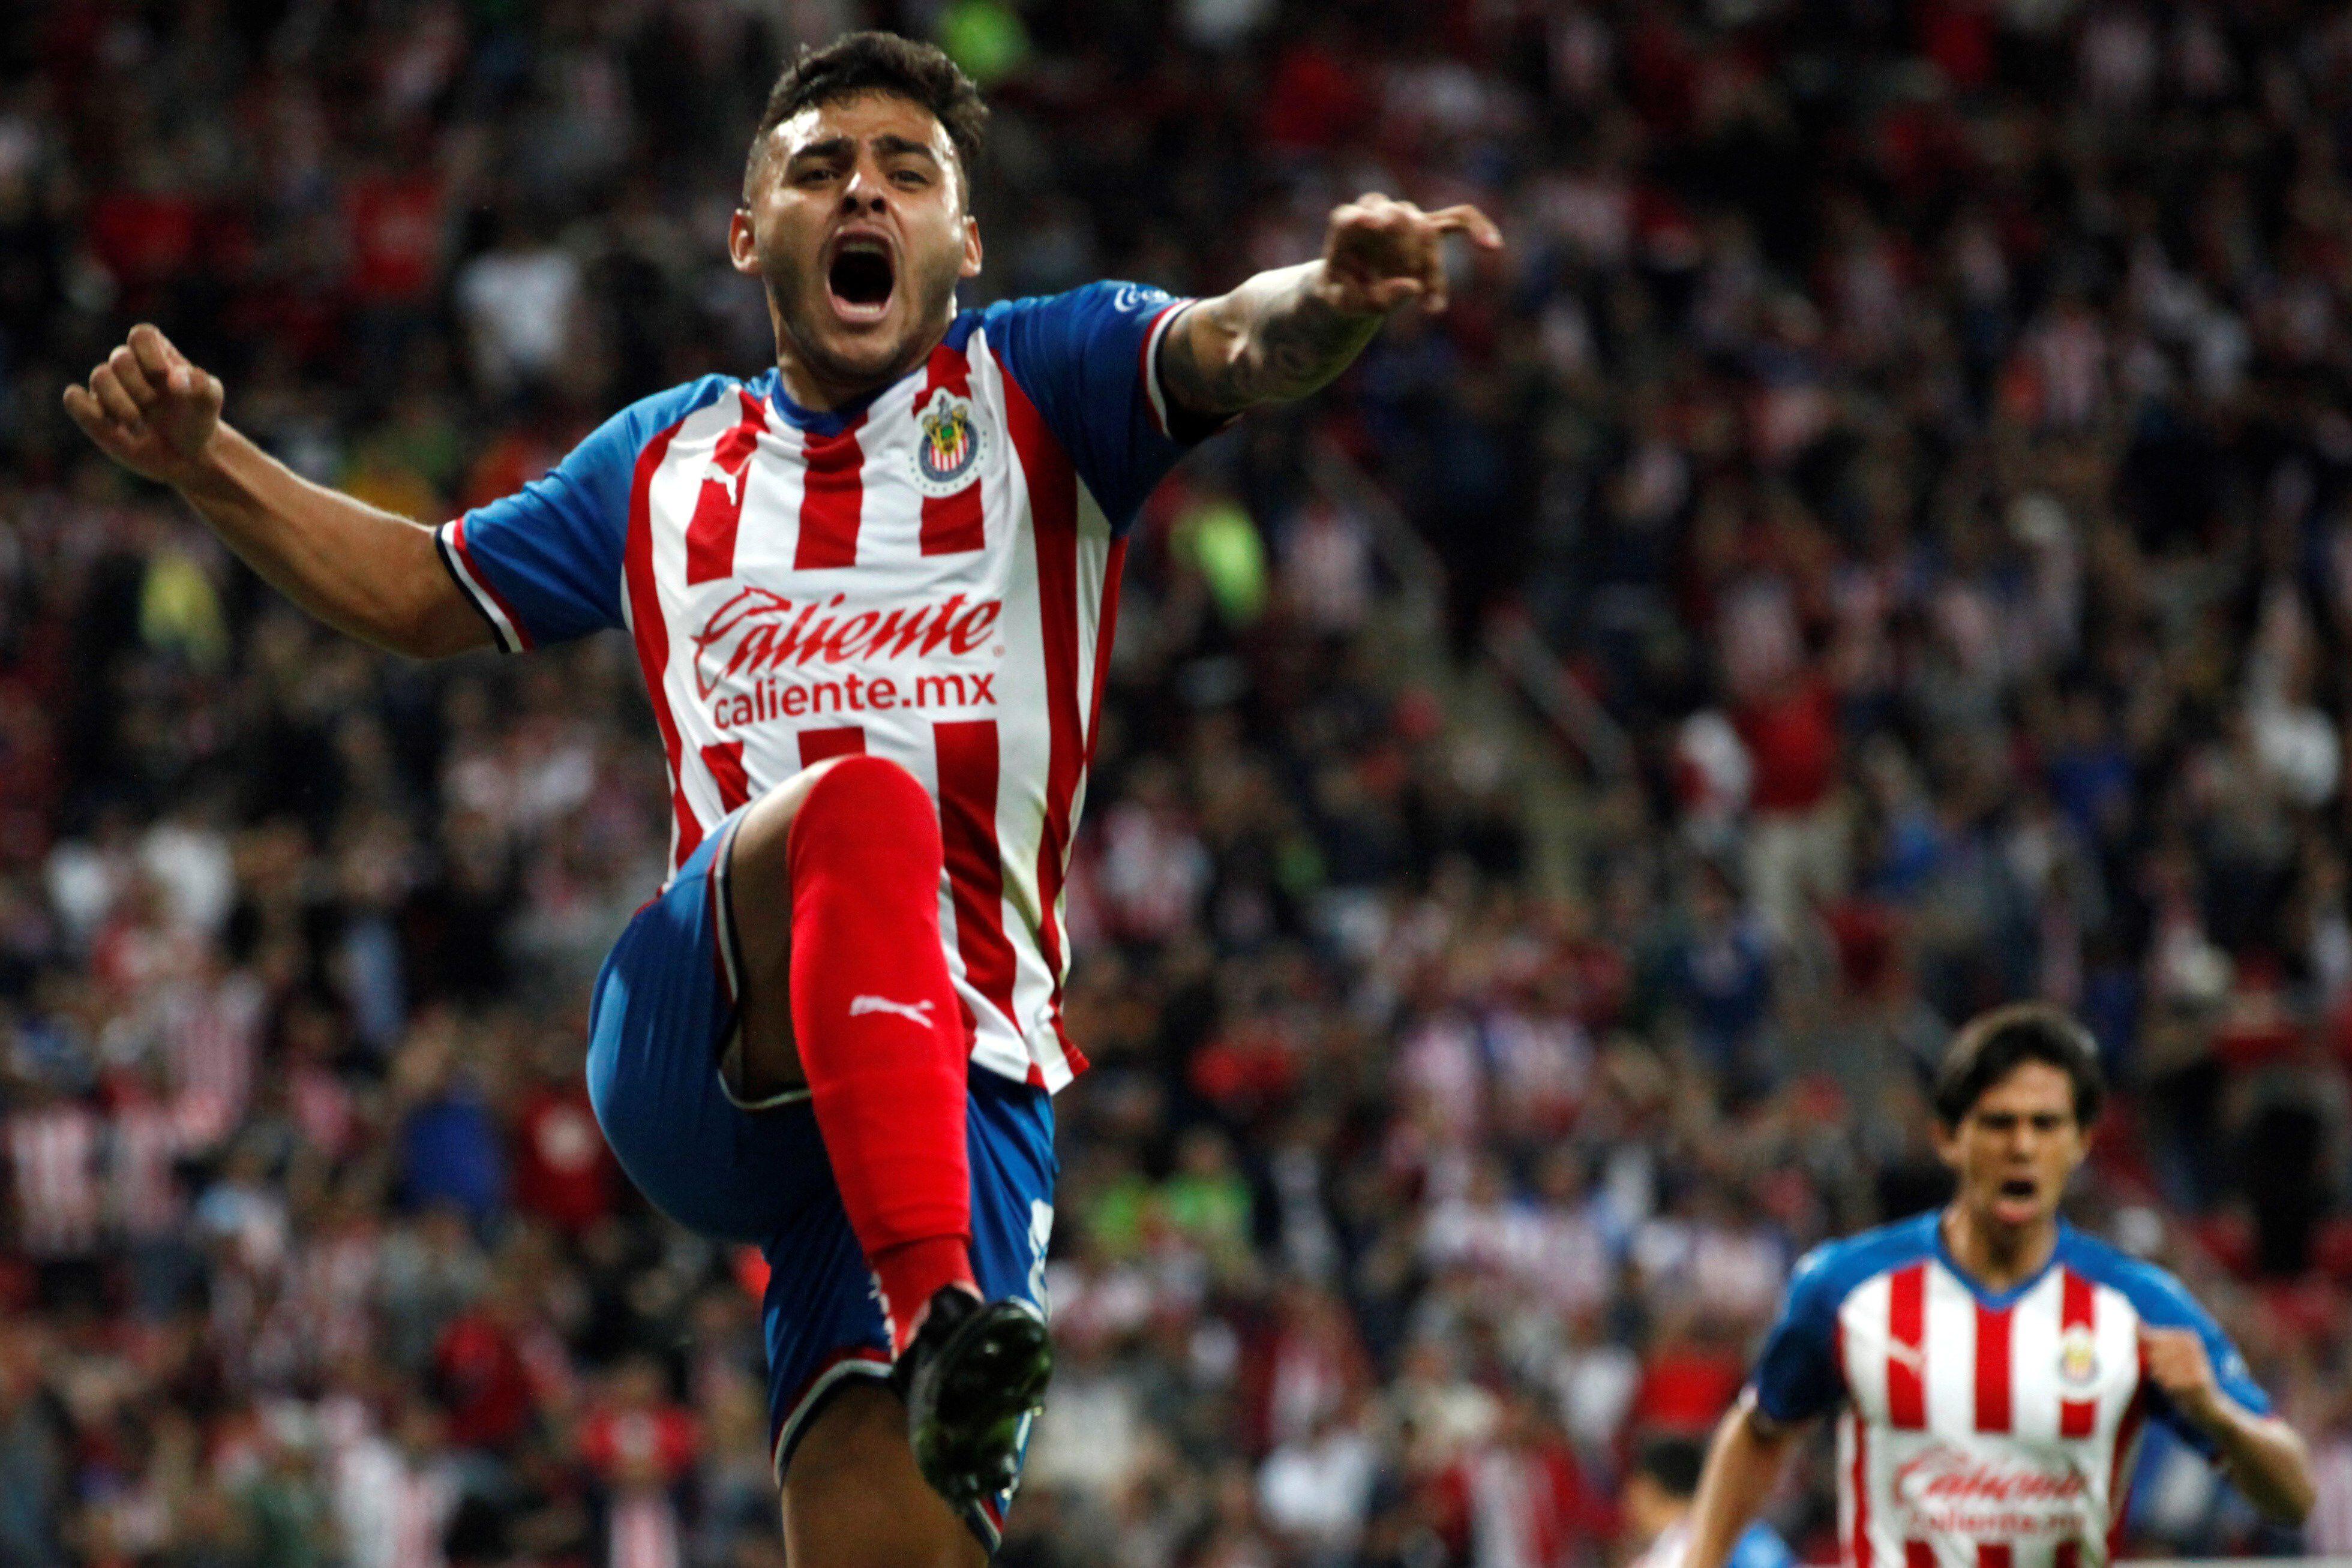 Alexis Vega declaró que las Chivas no jugarán ante Real Madrid o Bayern Munich en la jornada 10 de la liga MX del A2021 (Foto: EFE/ Francisco Guasco)